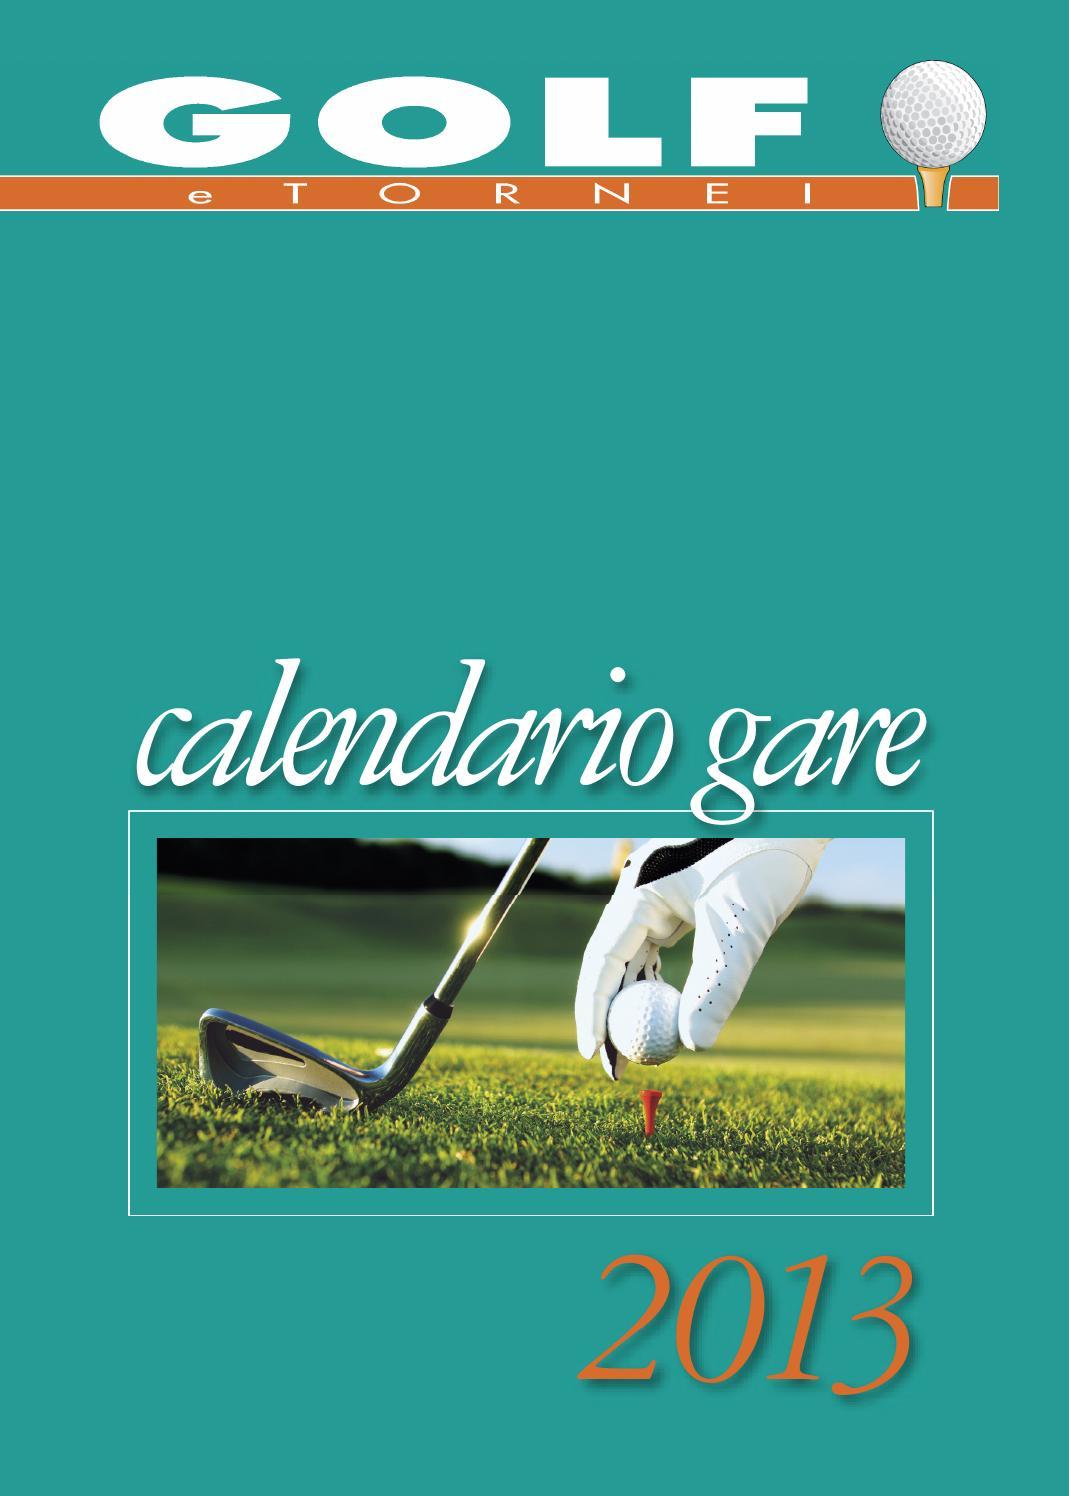 Acaya Golf Club Calendario Gare.Golf E Tornei Calendario Gare 2013 By Susanna Ielmini Issuu